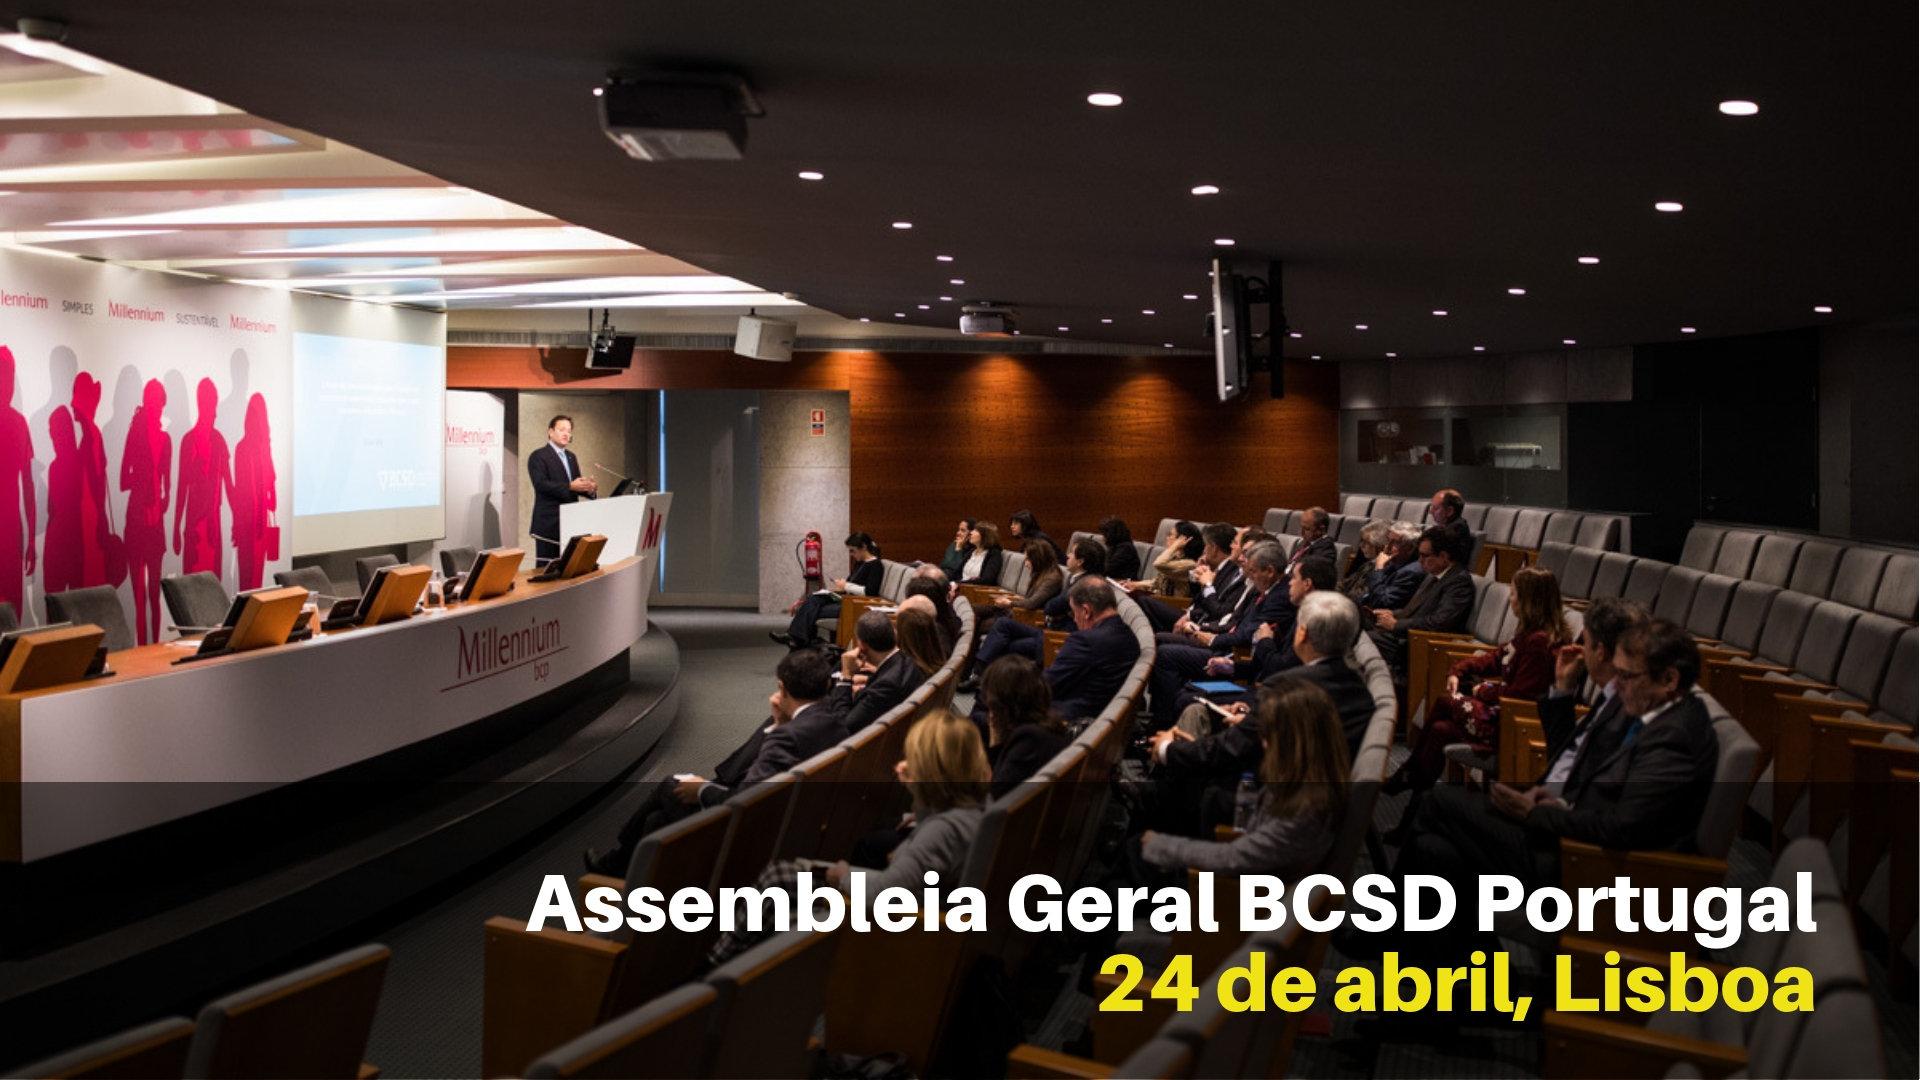 Assembleia Geral BCSD Portugal